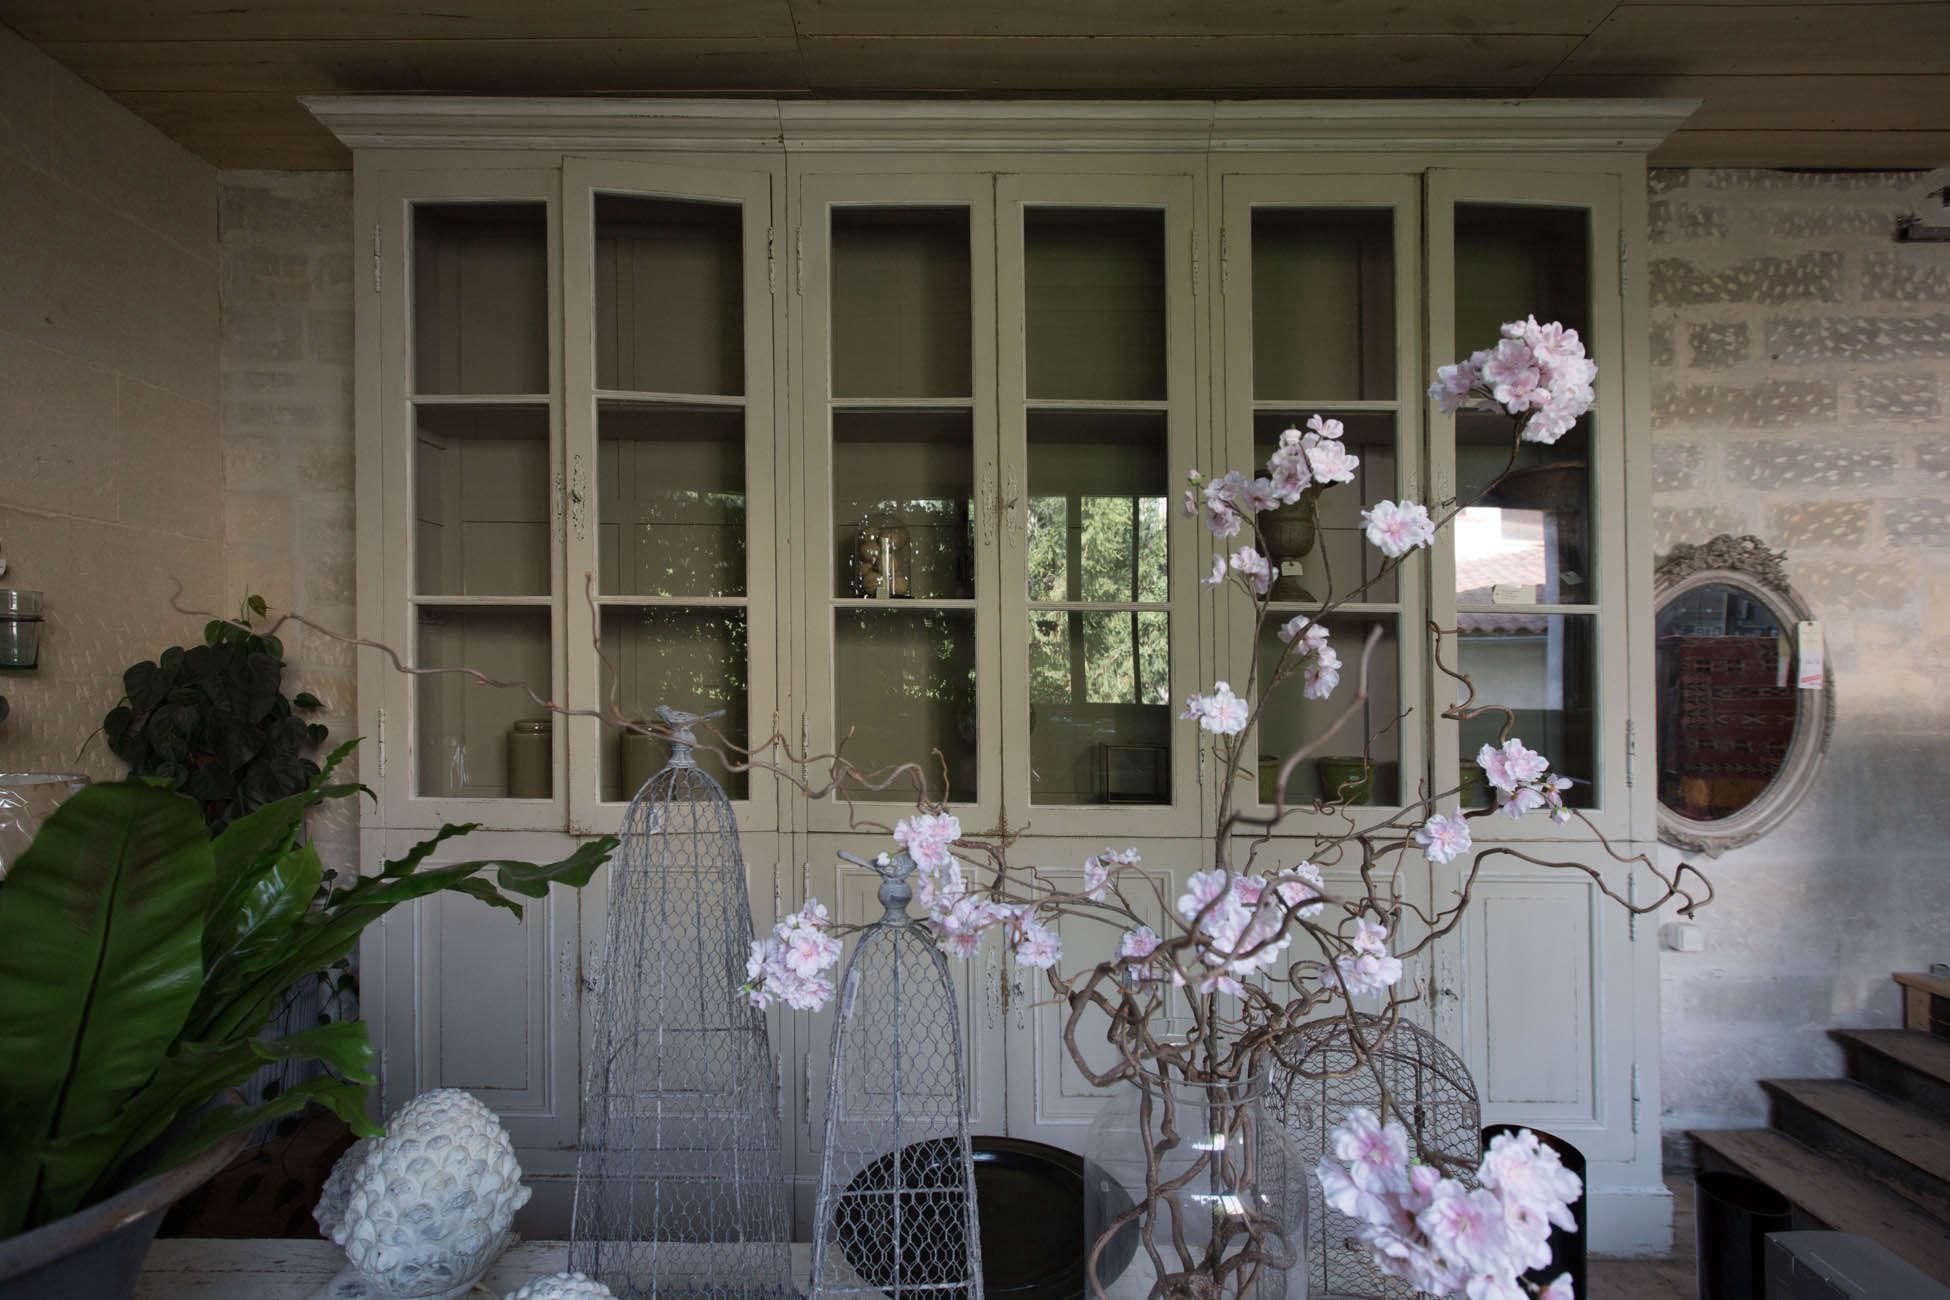 Ambre-store-france-mimi-giboin-gardenista-047